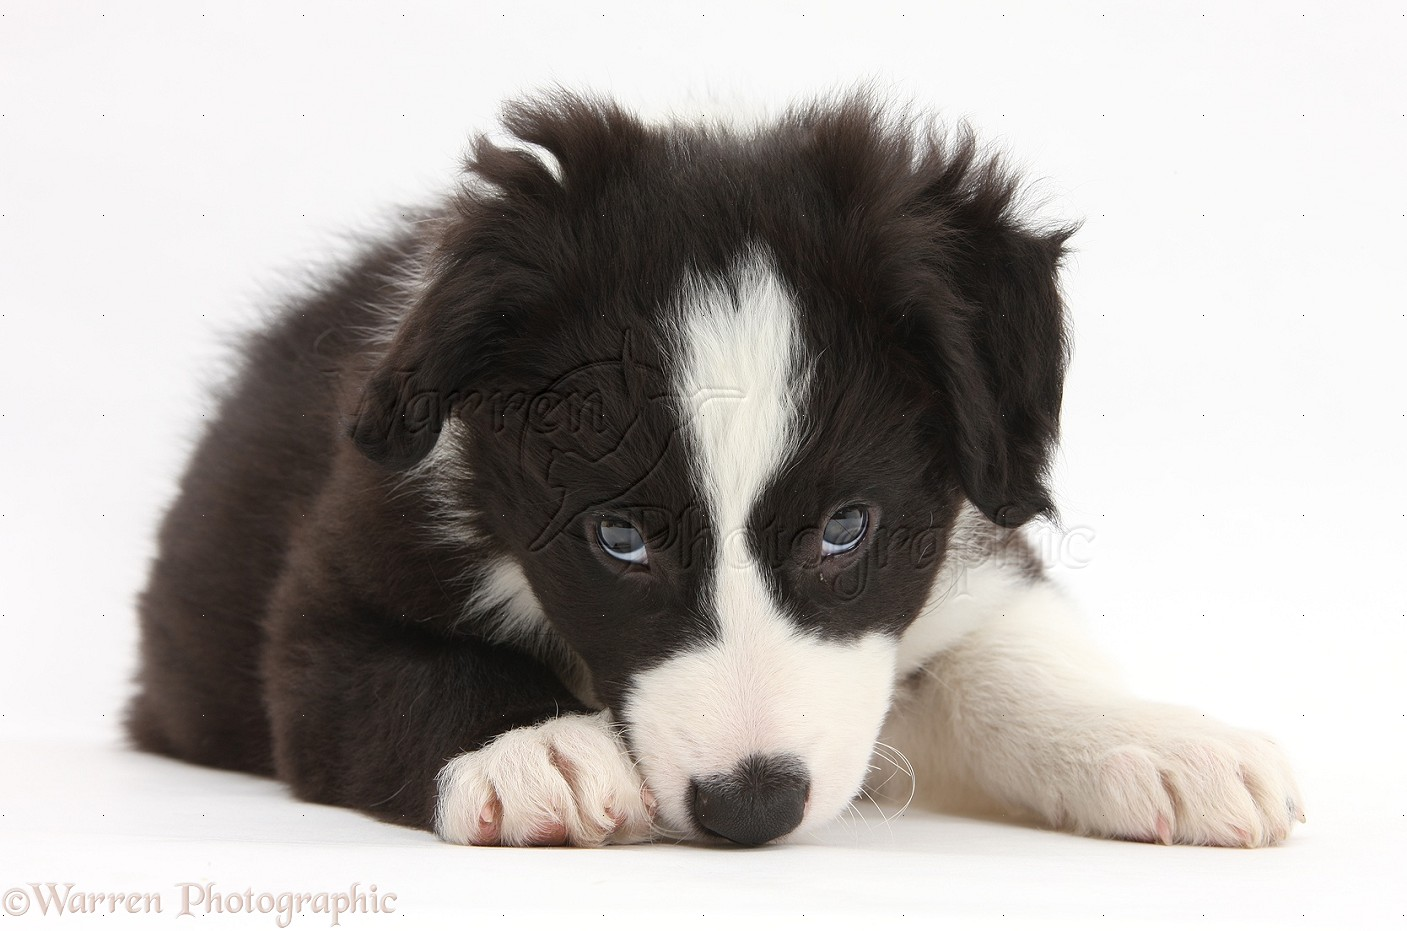 Dog black and white border collie pup photo wp35046 - Black and wait ...